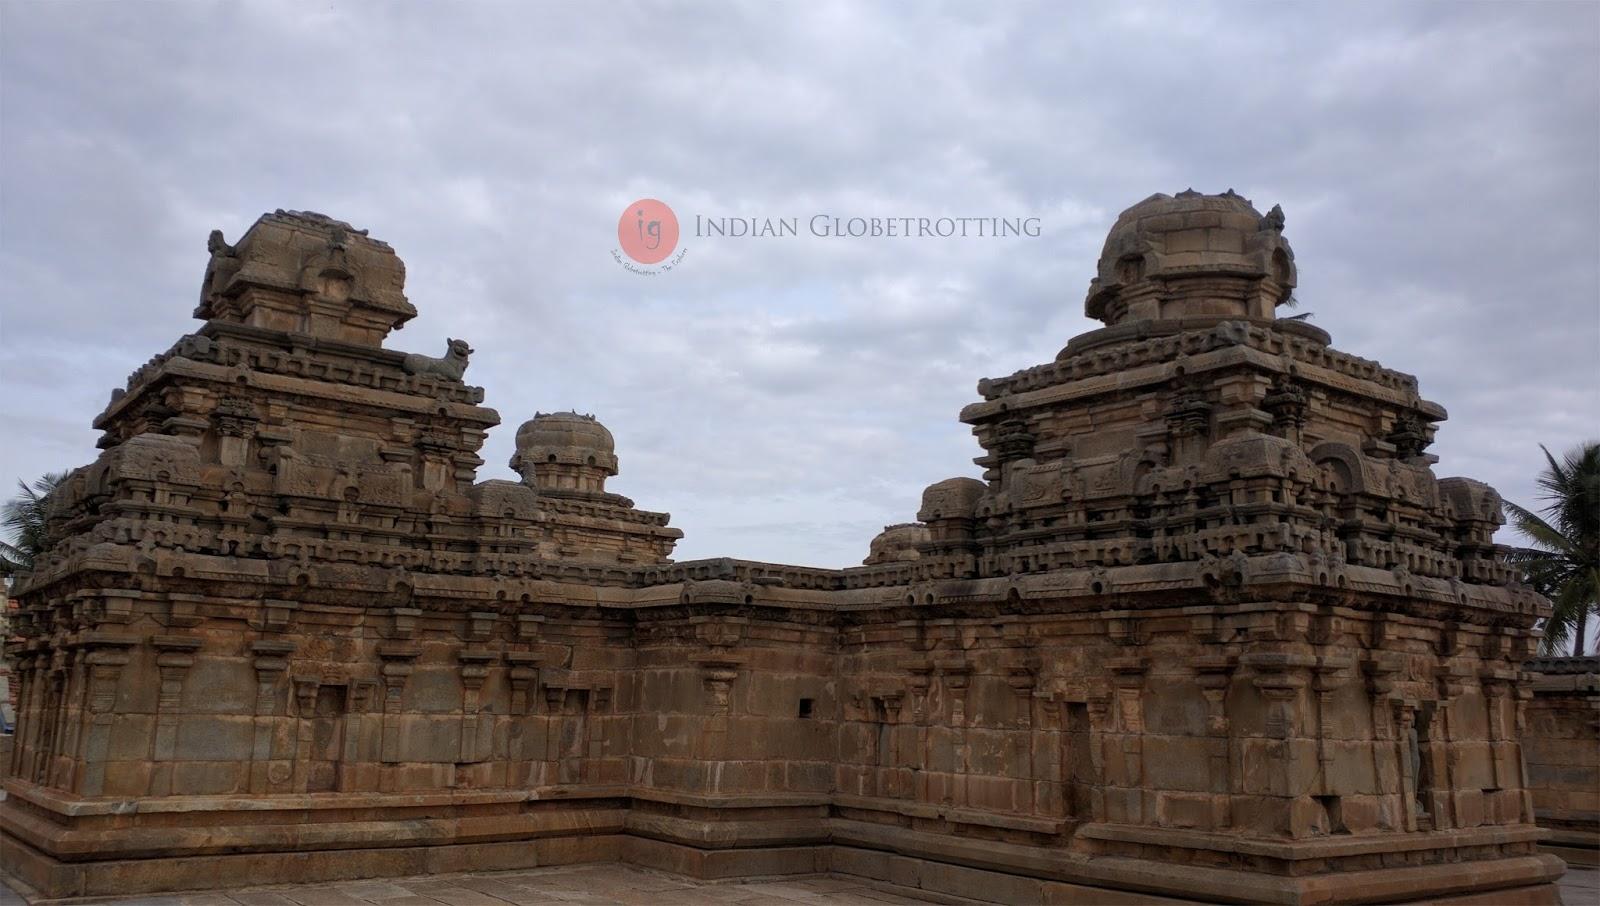 Panchakuta Basadi jain temple in Kambadahalli